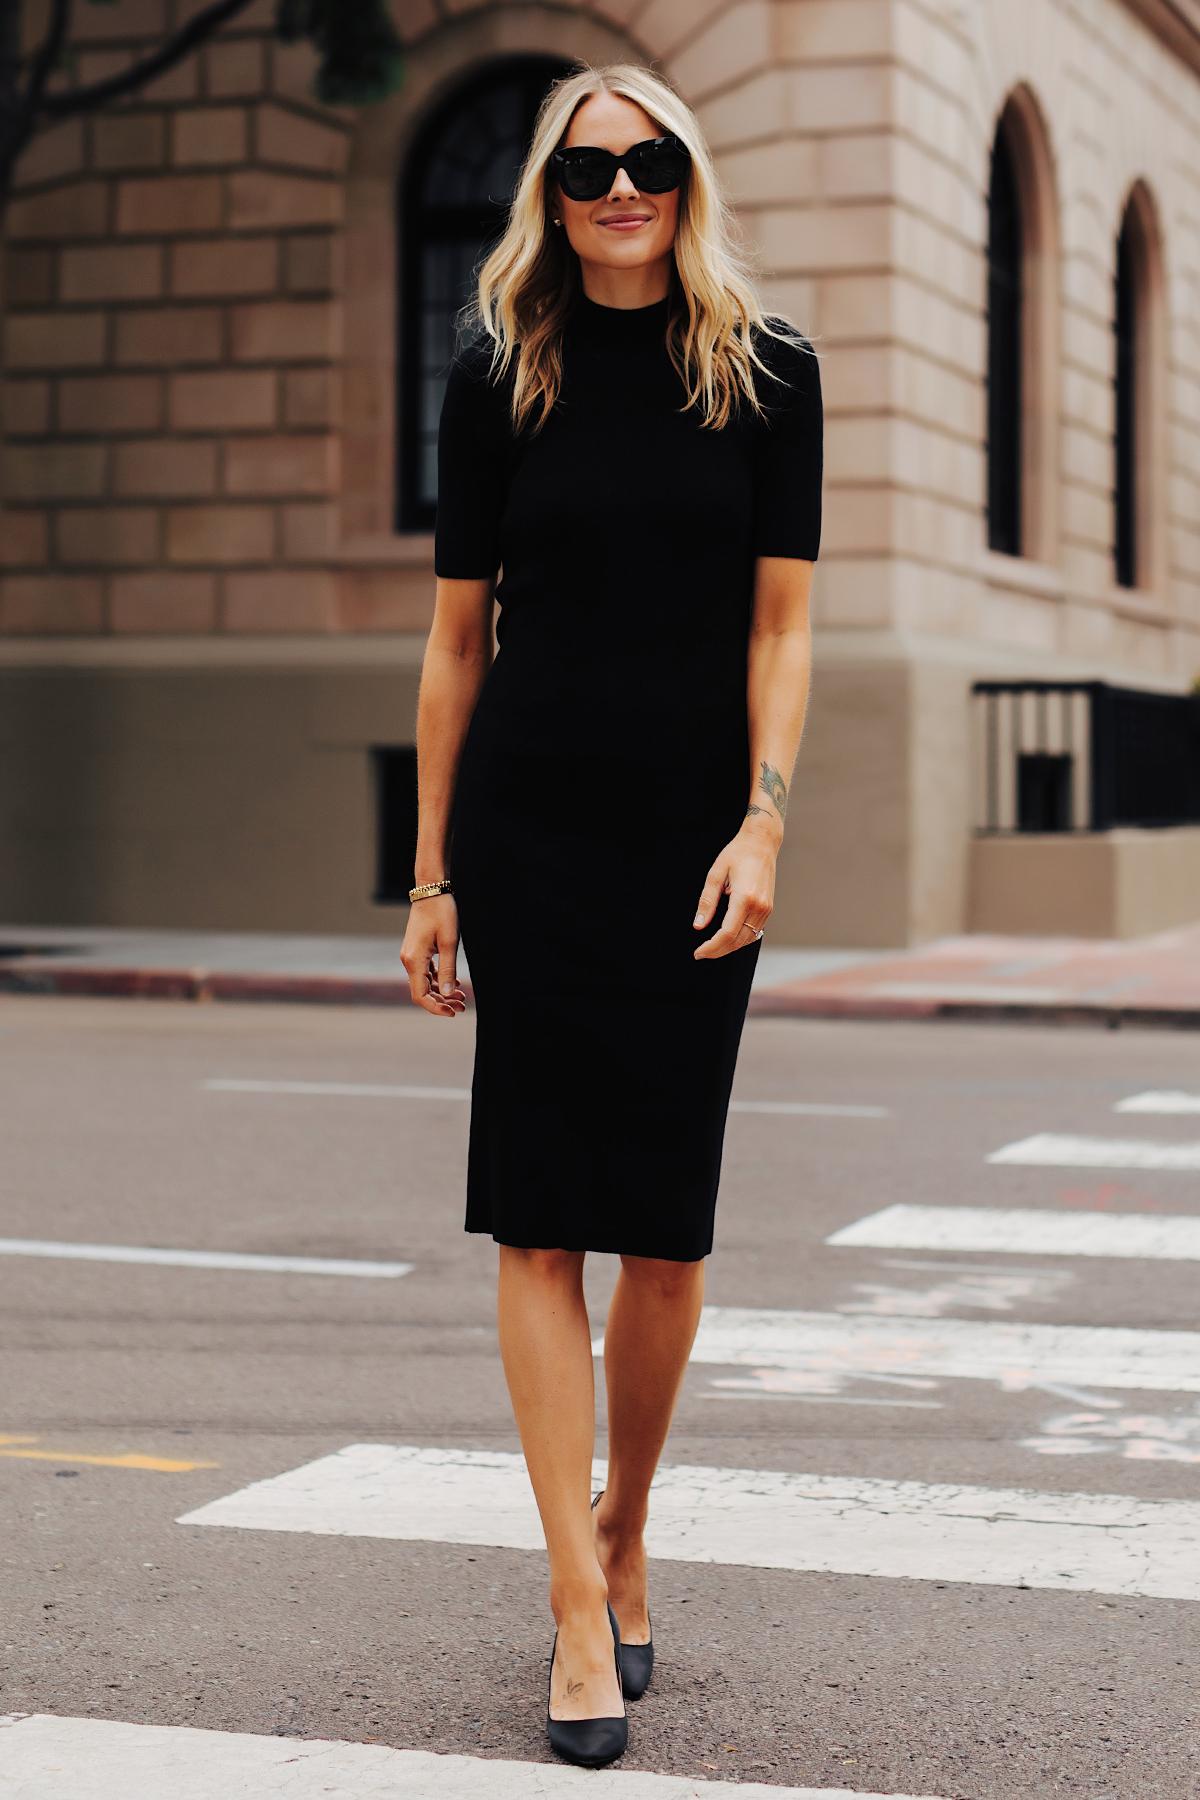 Fashion Jackson Wearing Black Midi Dress Black Pumps 2